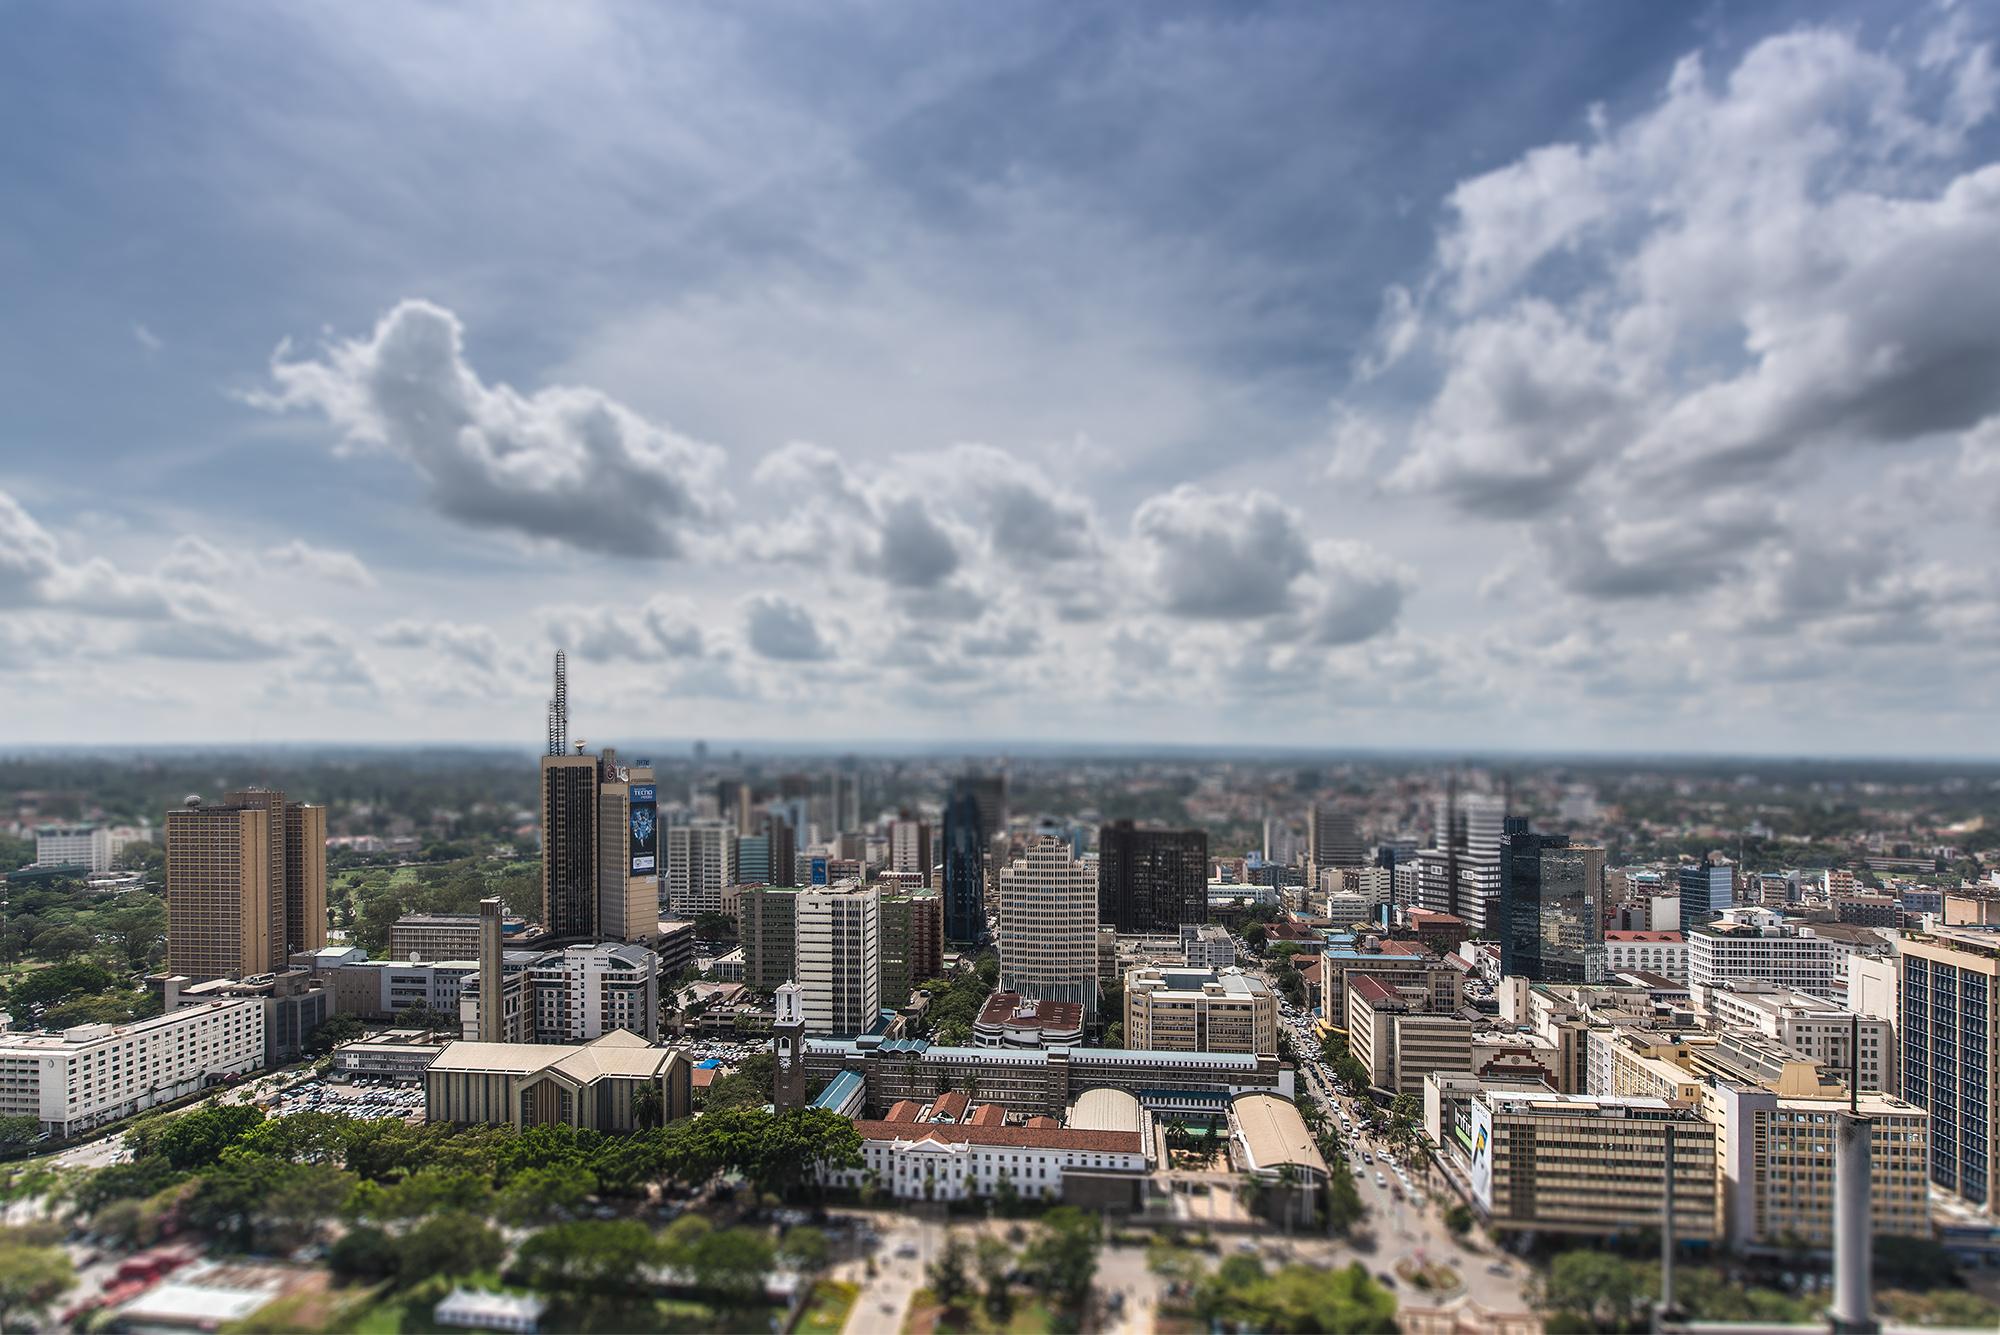 Skyline of downtown Nairobi